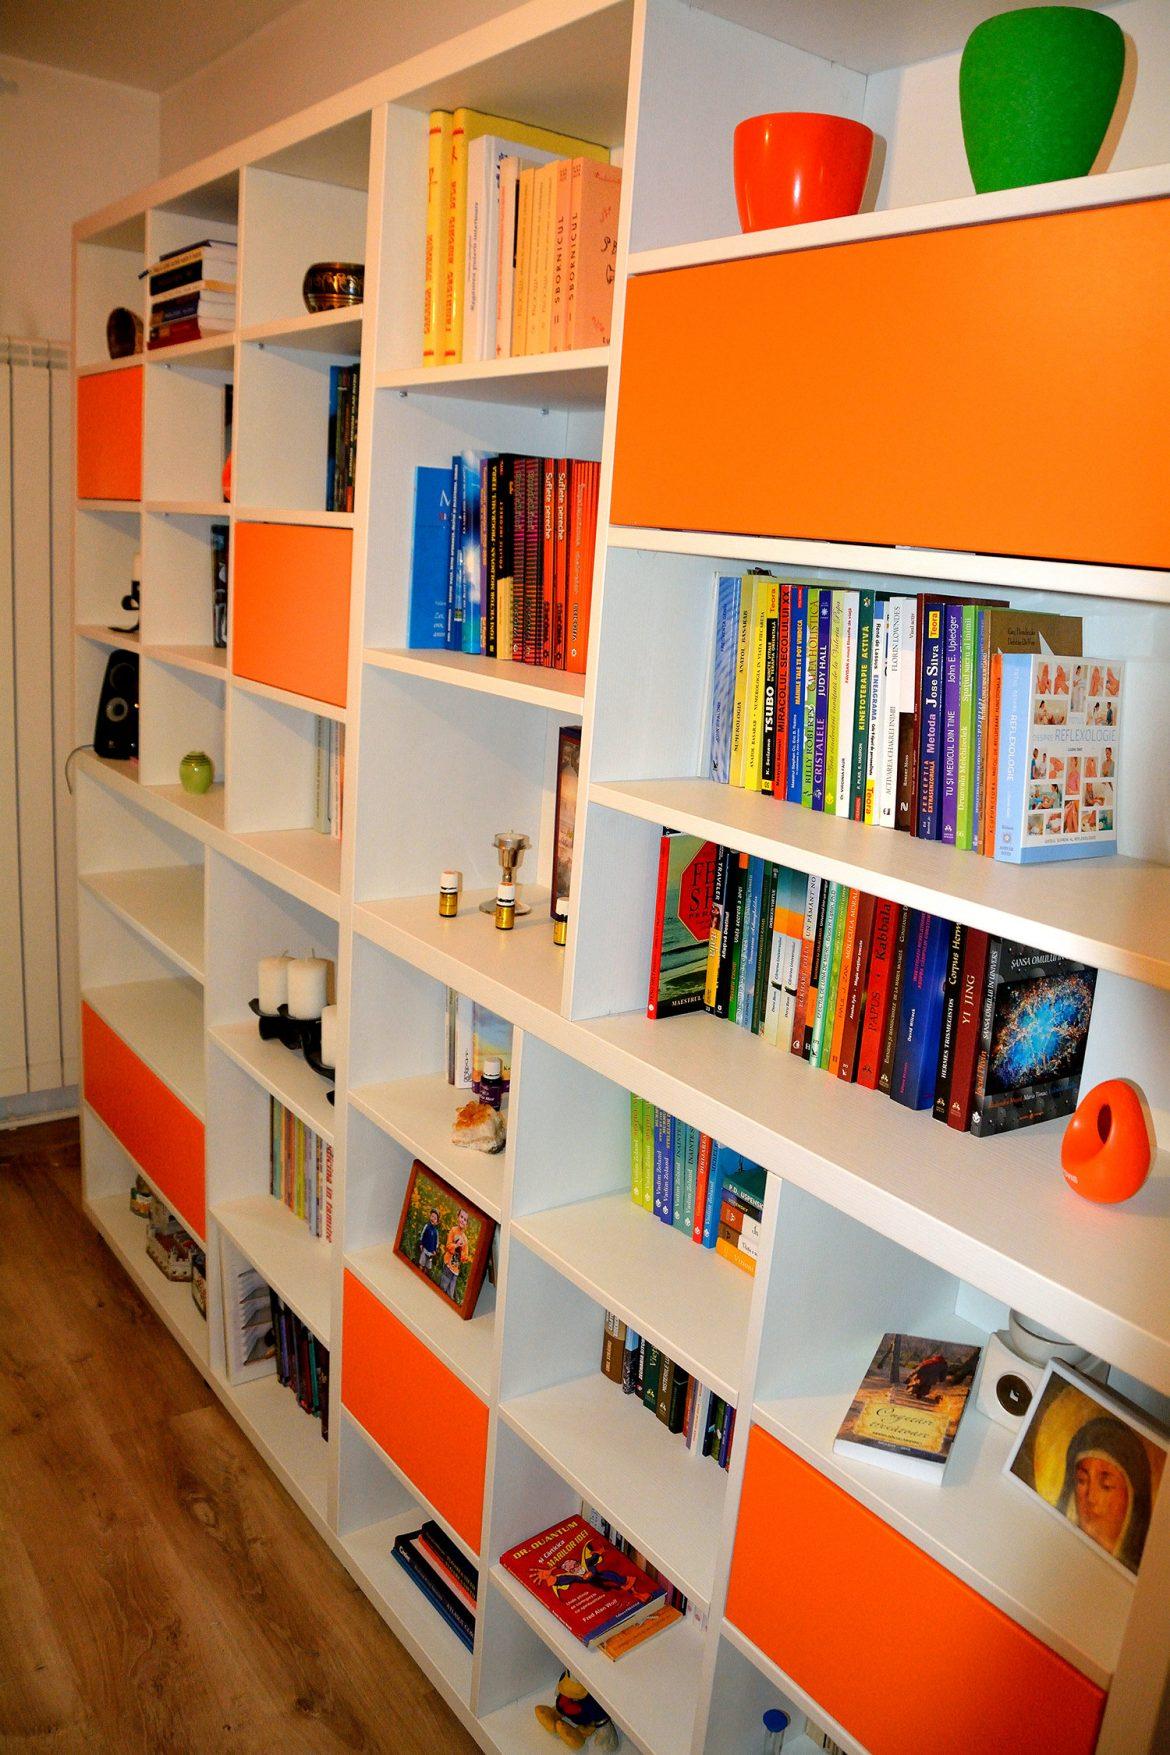 Detaliu biblioteca moderna realizata din pal alb fibros si Orange